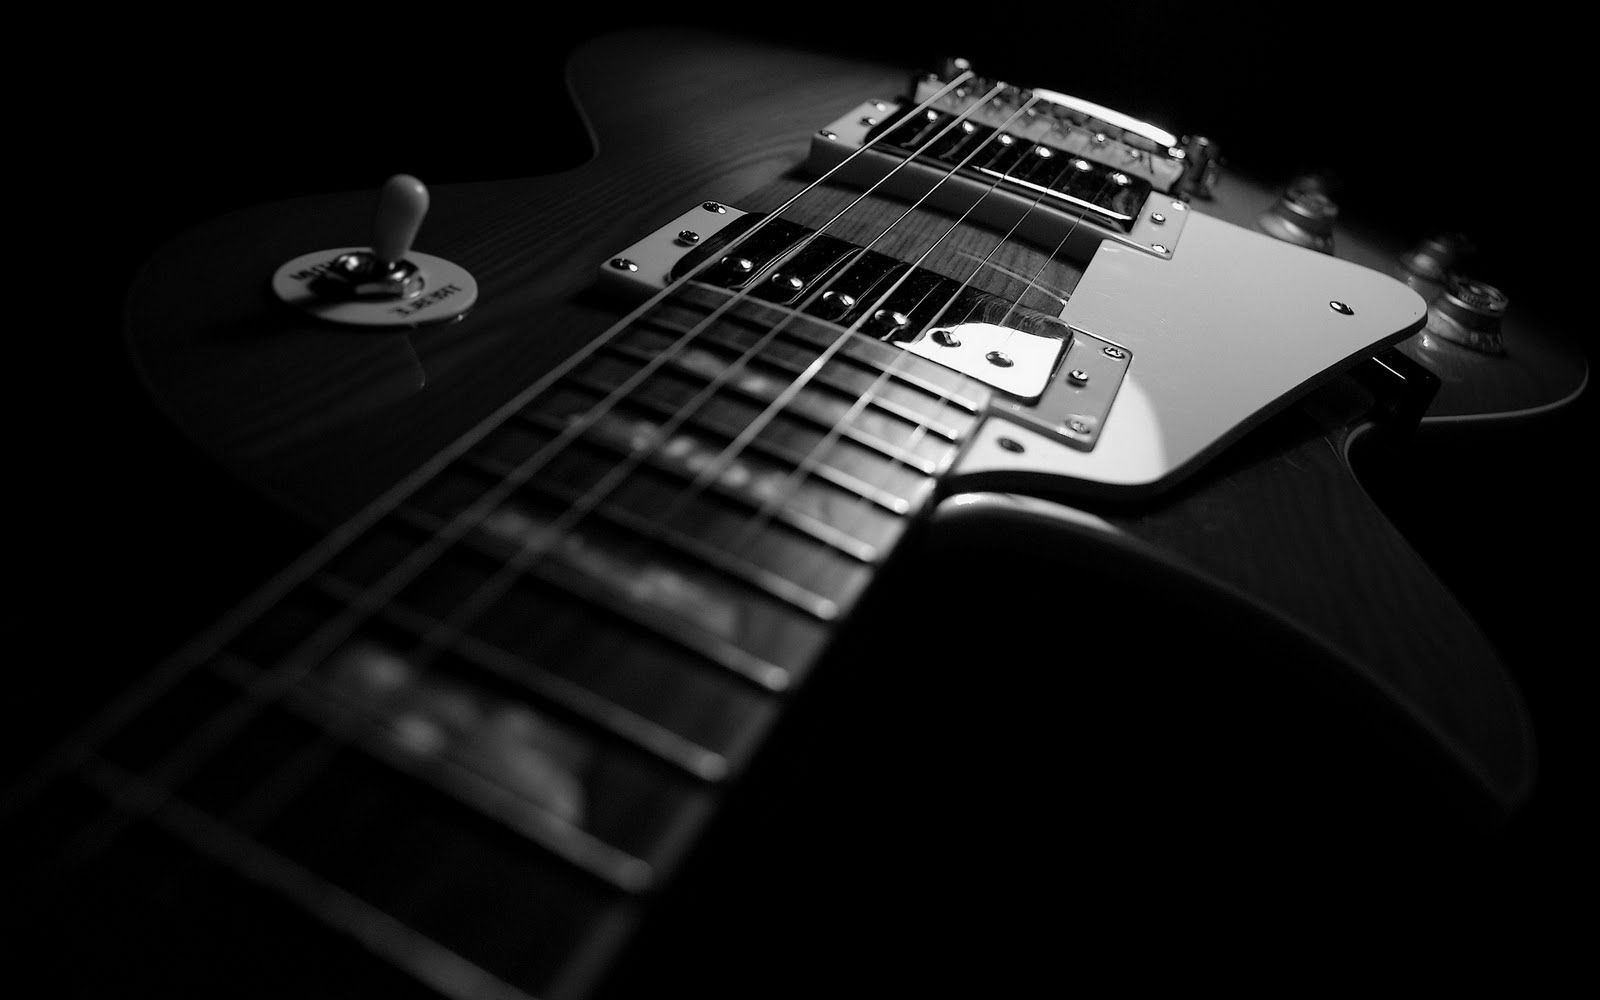 Hd wallpaper gitar - Full Hd P Guitar Wallpapers Hd Desktop Backgrounds X